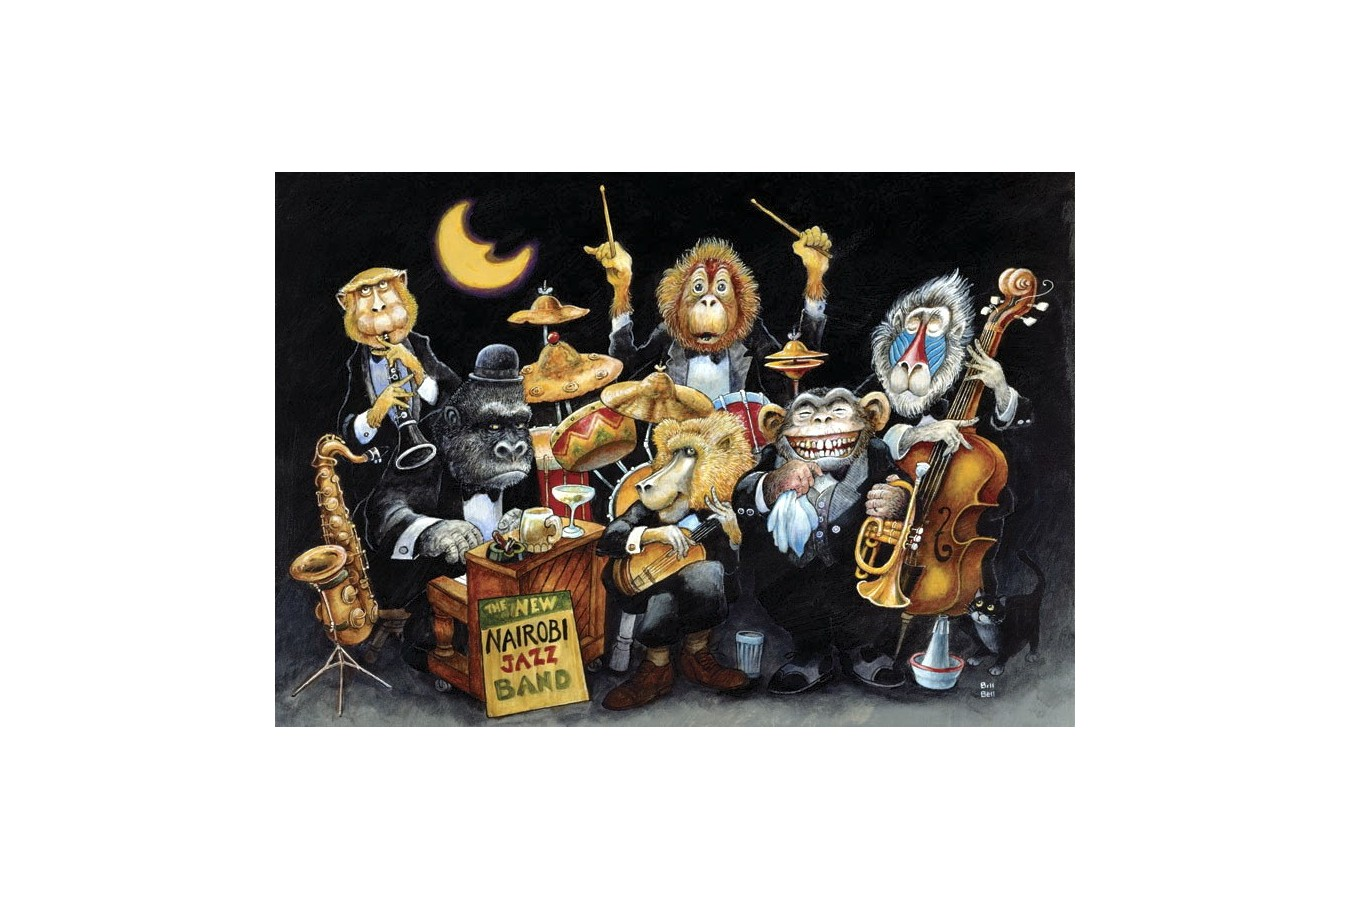 Puzzle Anatolian - The New Nairobi Jazz Band, 500 piese (3580)